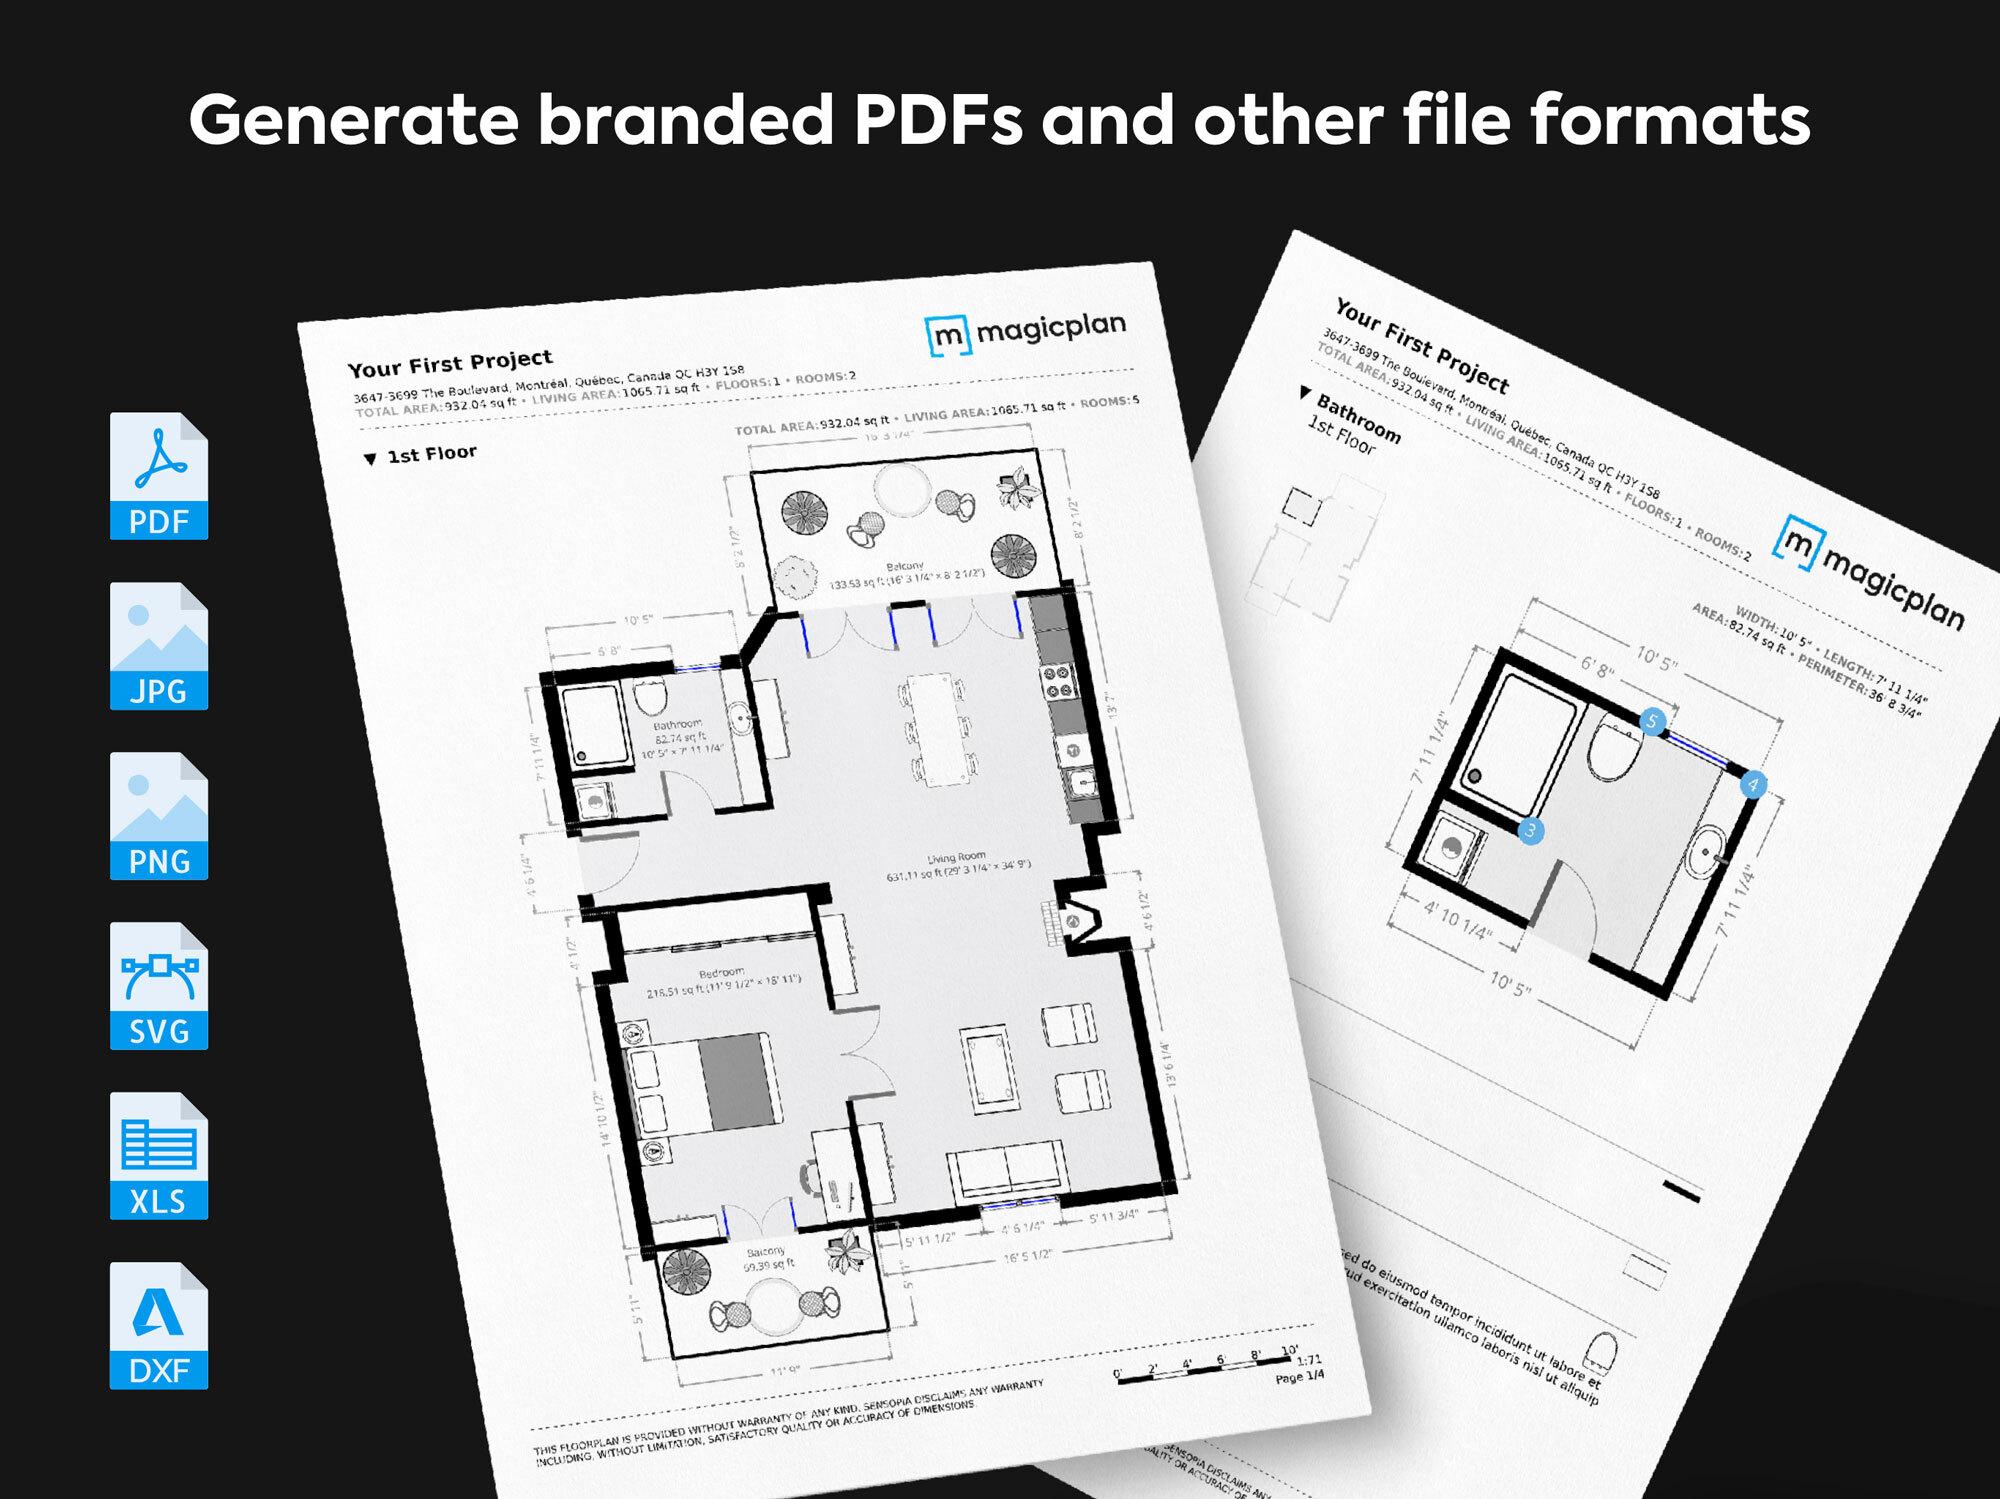 magicplan---Branded-PDFs